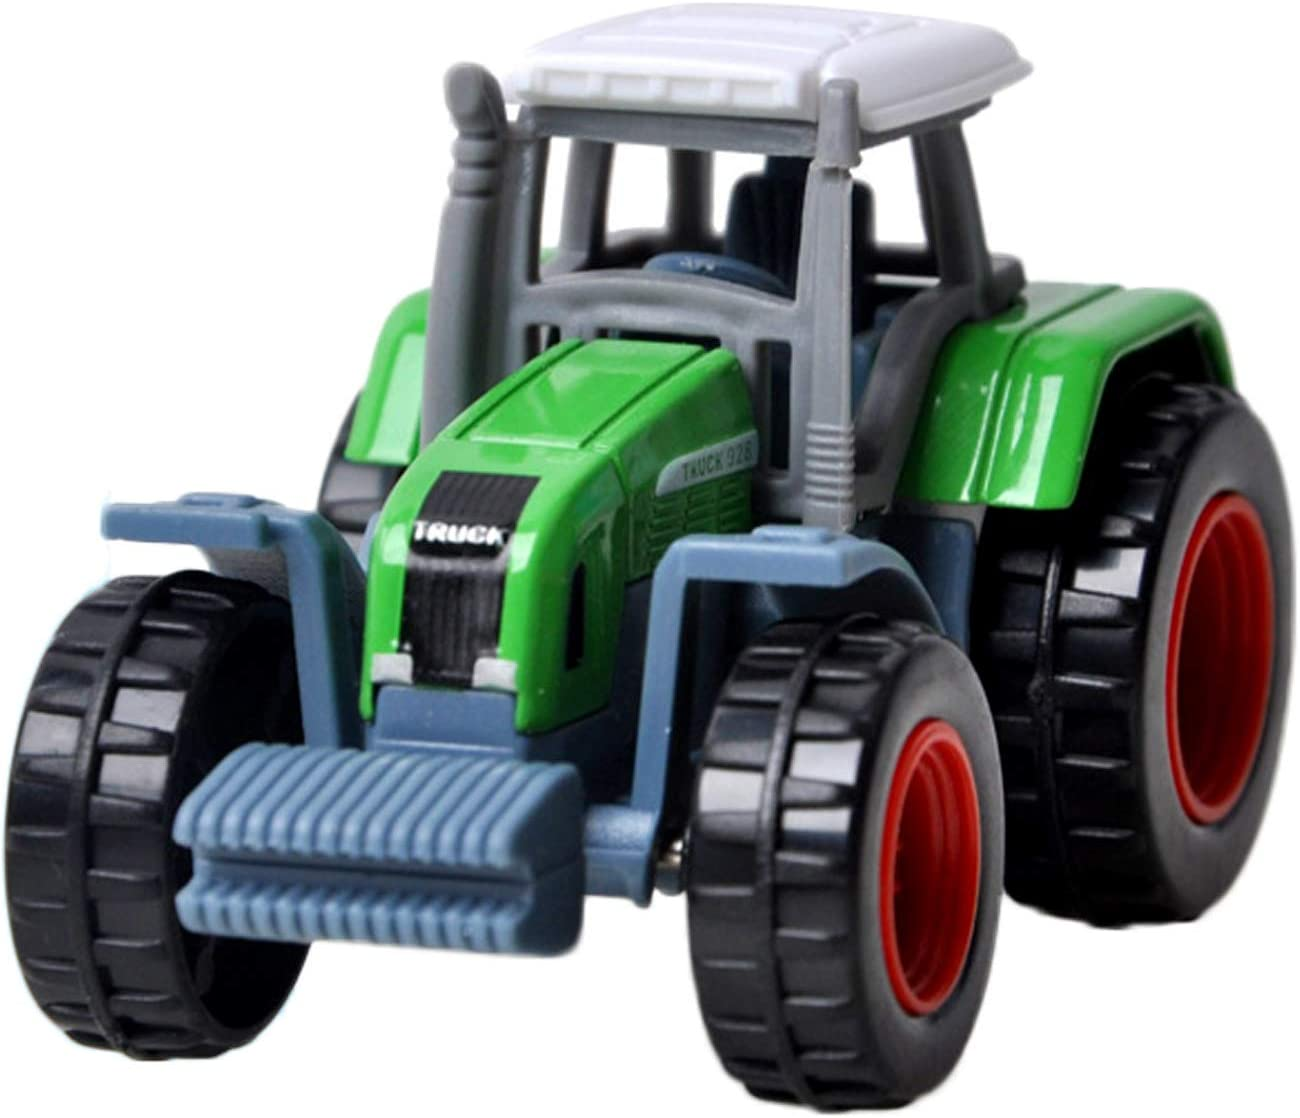 Beetest Farm Vehicles Toys 4pcs Mini Cute Alloy Farm Tractor Trailer Toys Vehicle Play Set for Boys Kids Style B